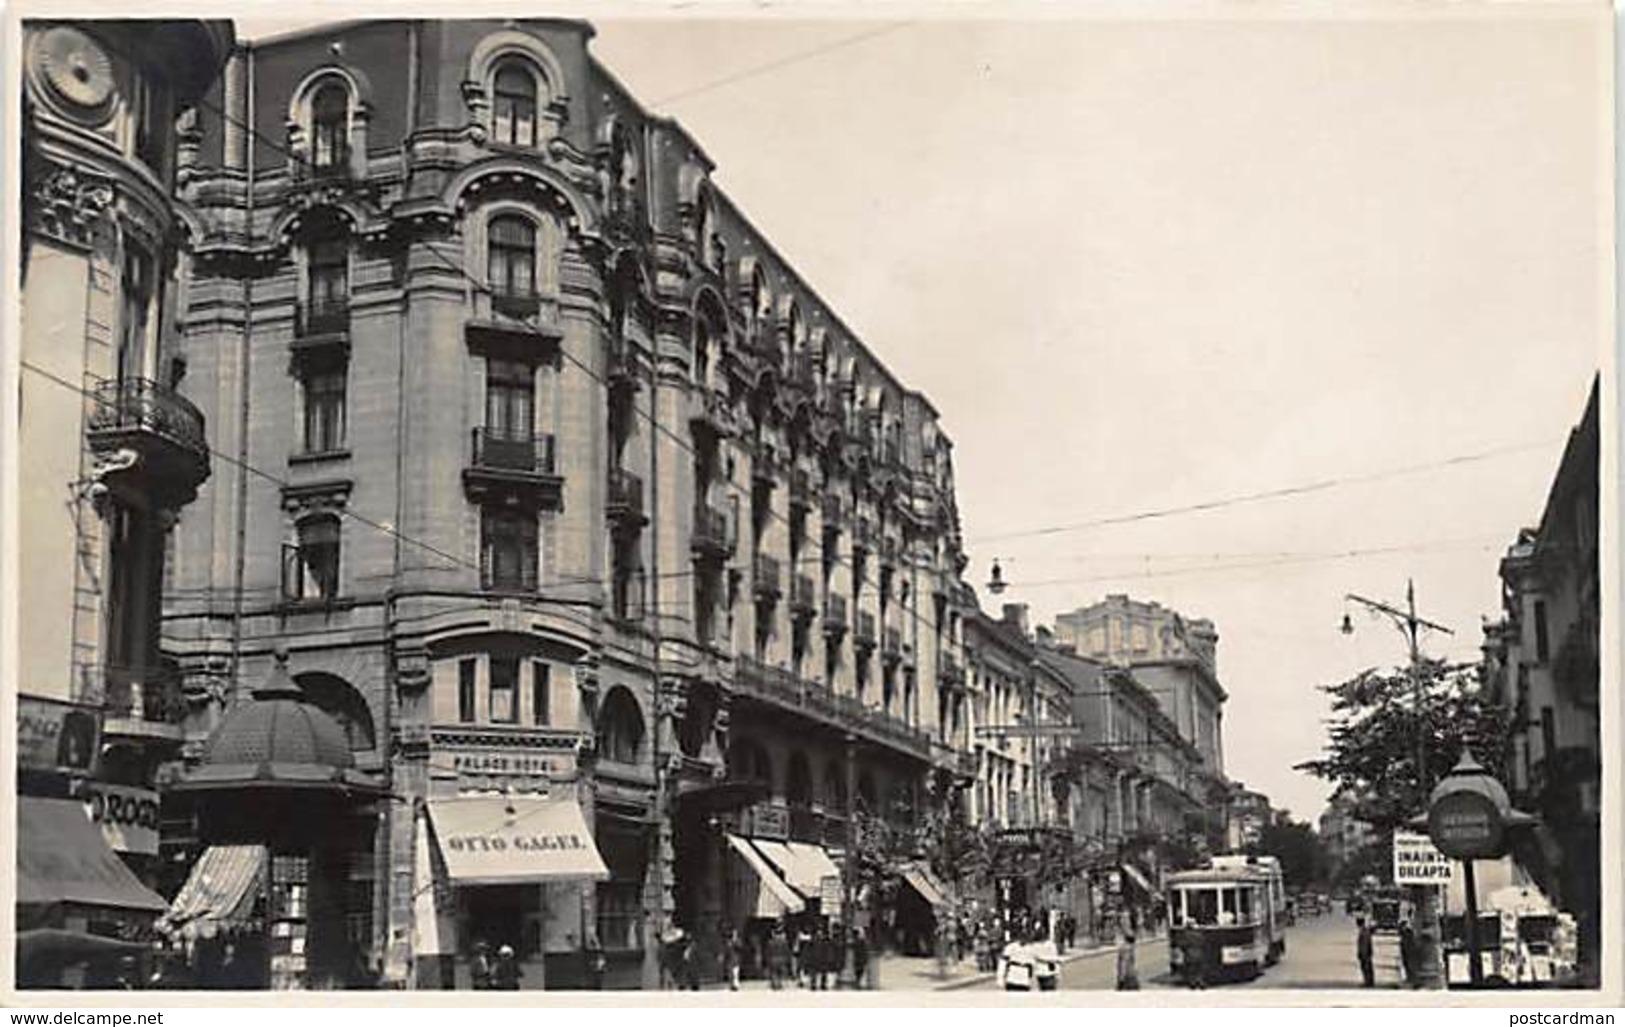 BUCURESTI Bucharest - Bulevardul Elisabeta. REAL PHOTO. - Rumania